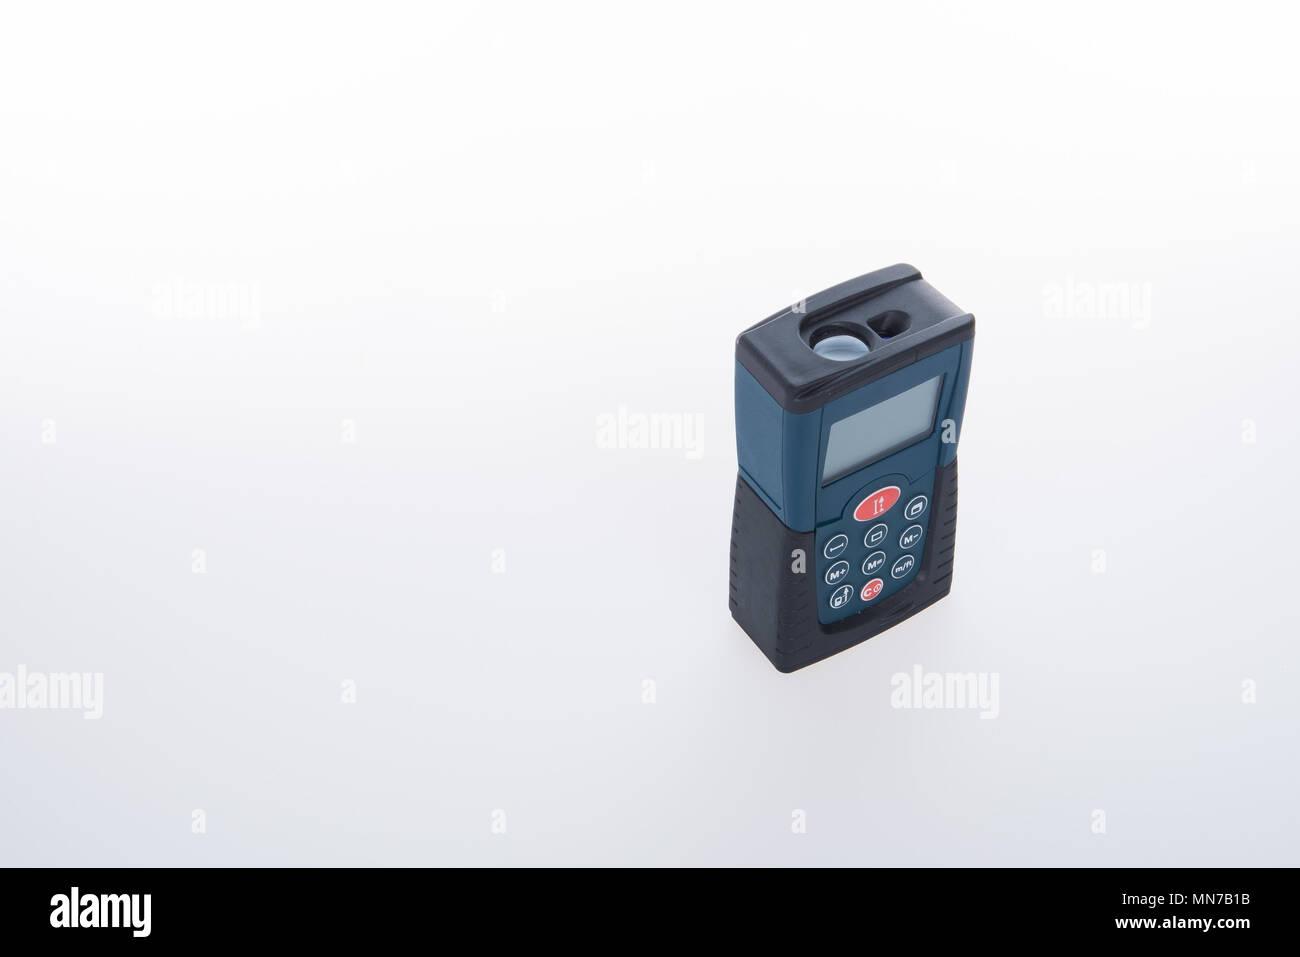 Laser entfernungsmesser ec technology m tragbar laser